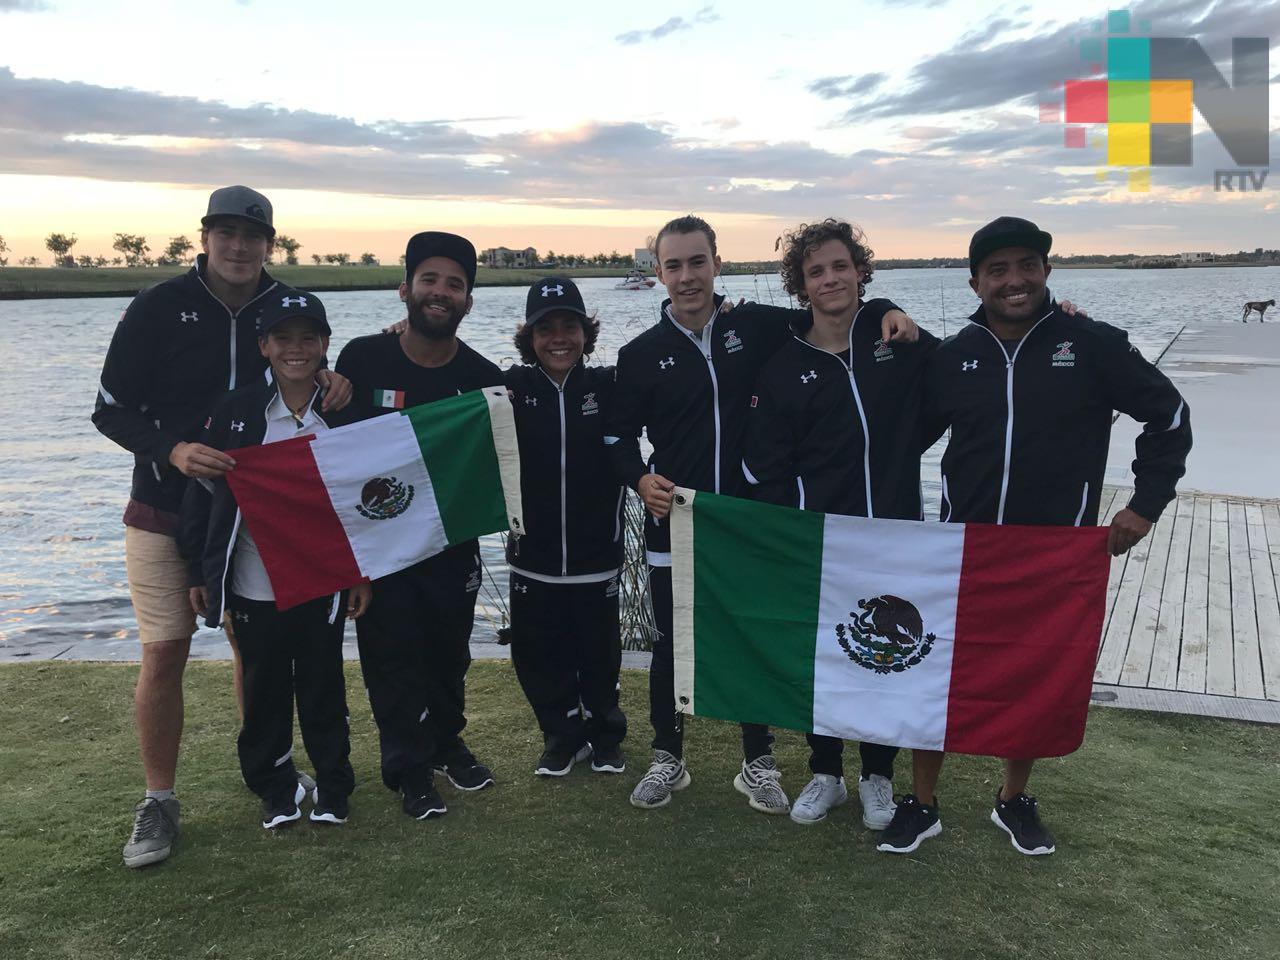 México consigue medalla histórica en wakeboard